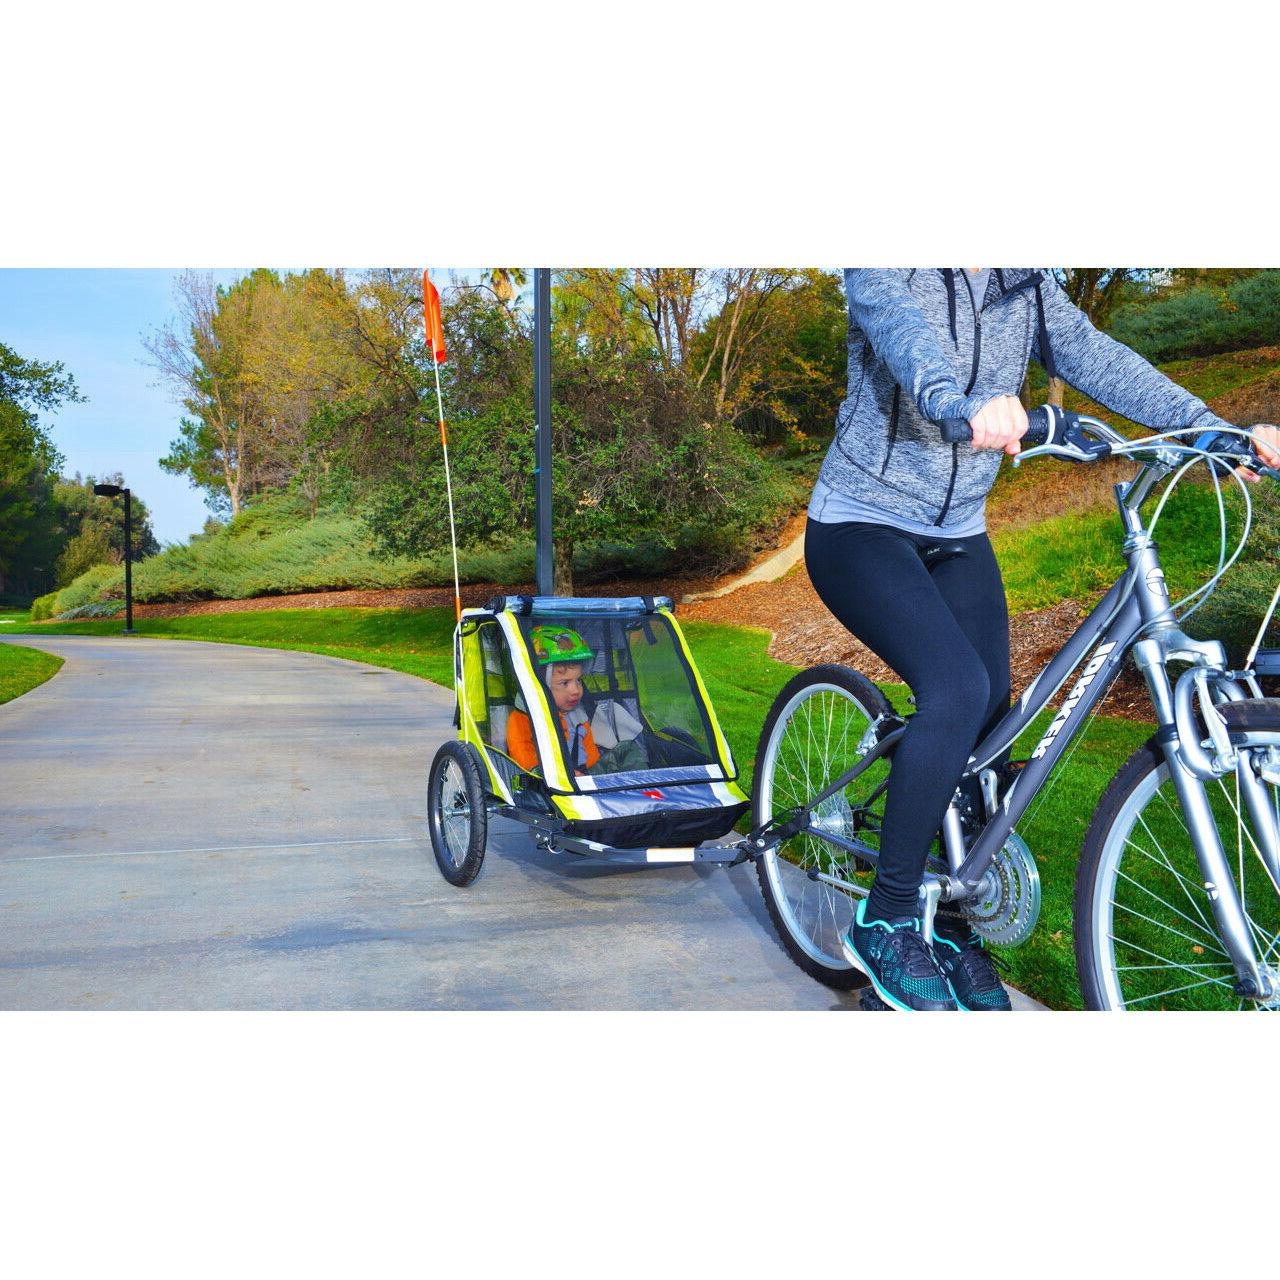 Sports Deluxe 2-Child Bike Trailer Kids